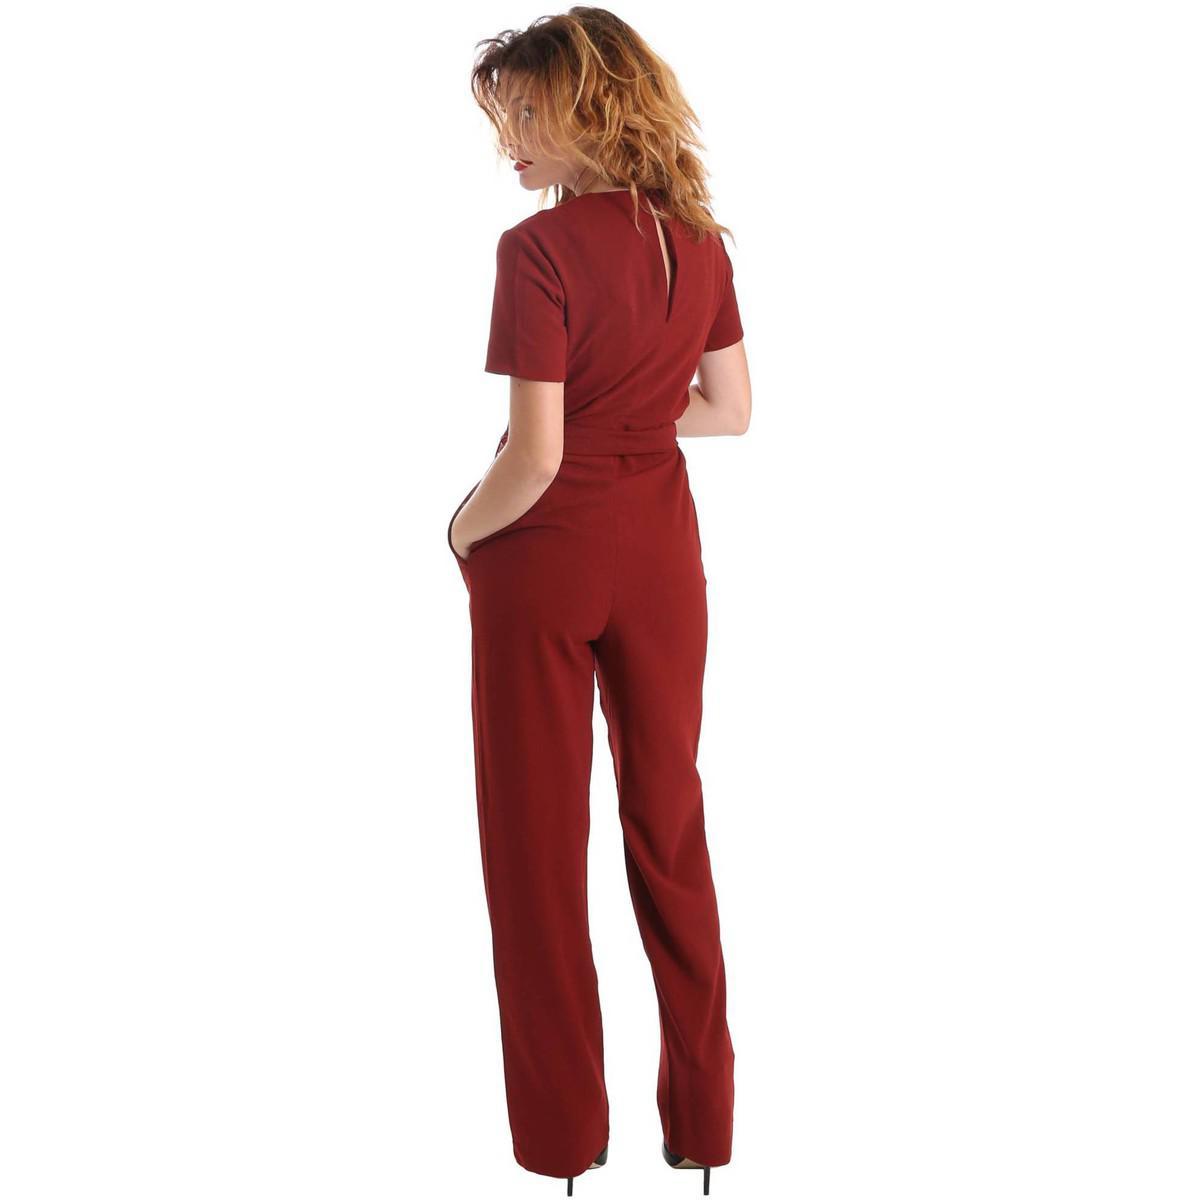 Pepe Jeans Denim Pl230142 Tuta Women Bordeaux Women's Jumpsuit In Red